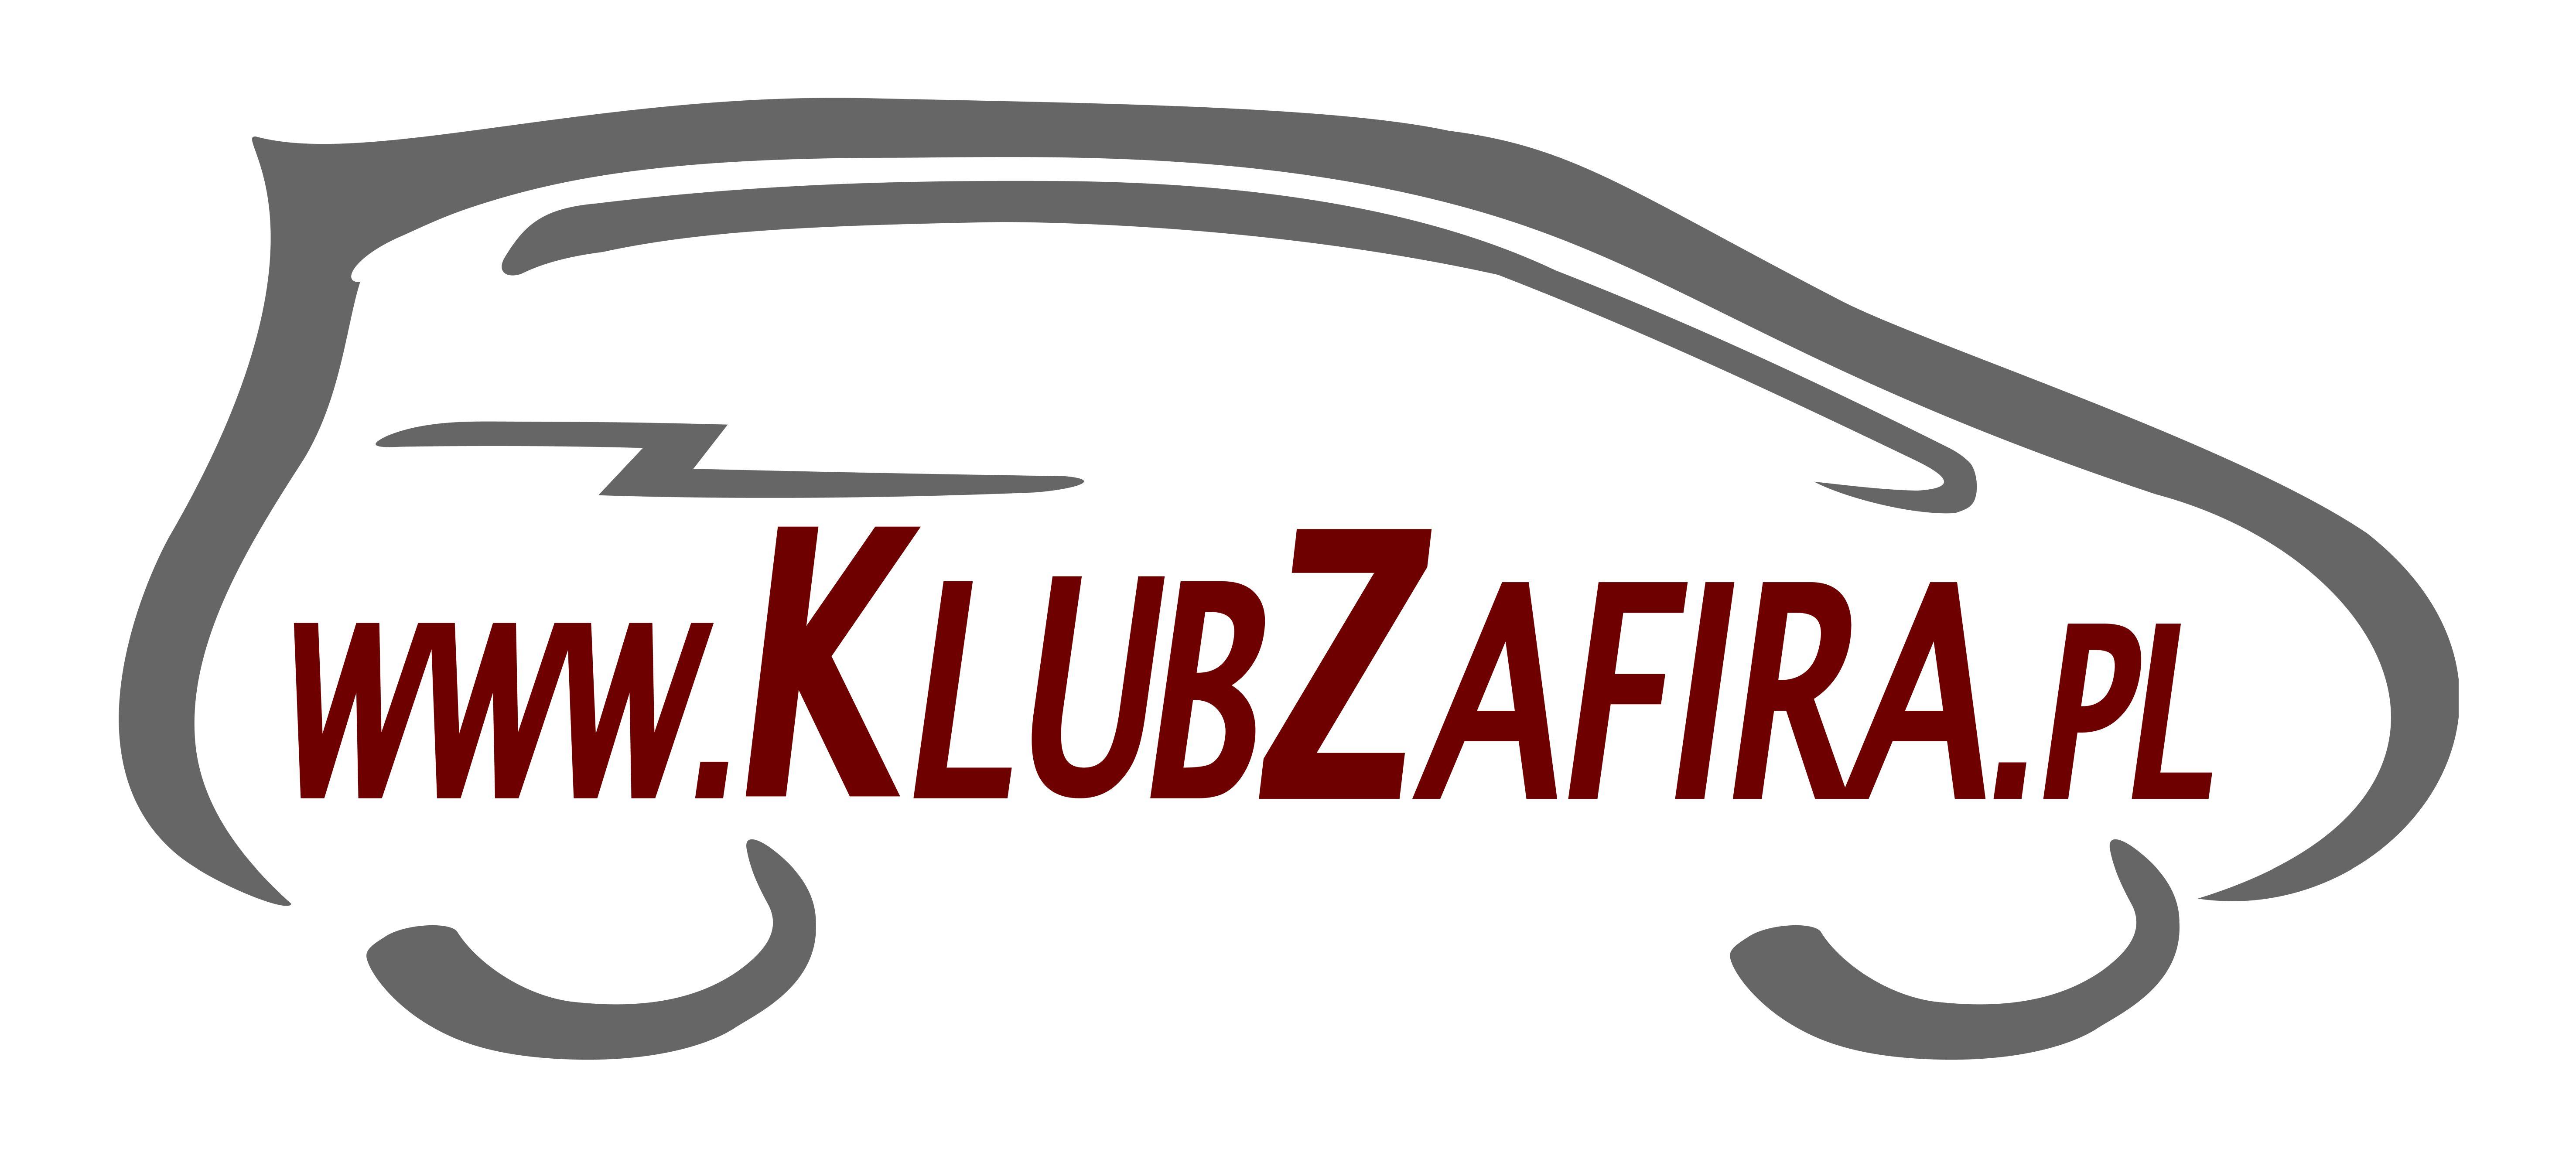 Logo klubzafirapl k